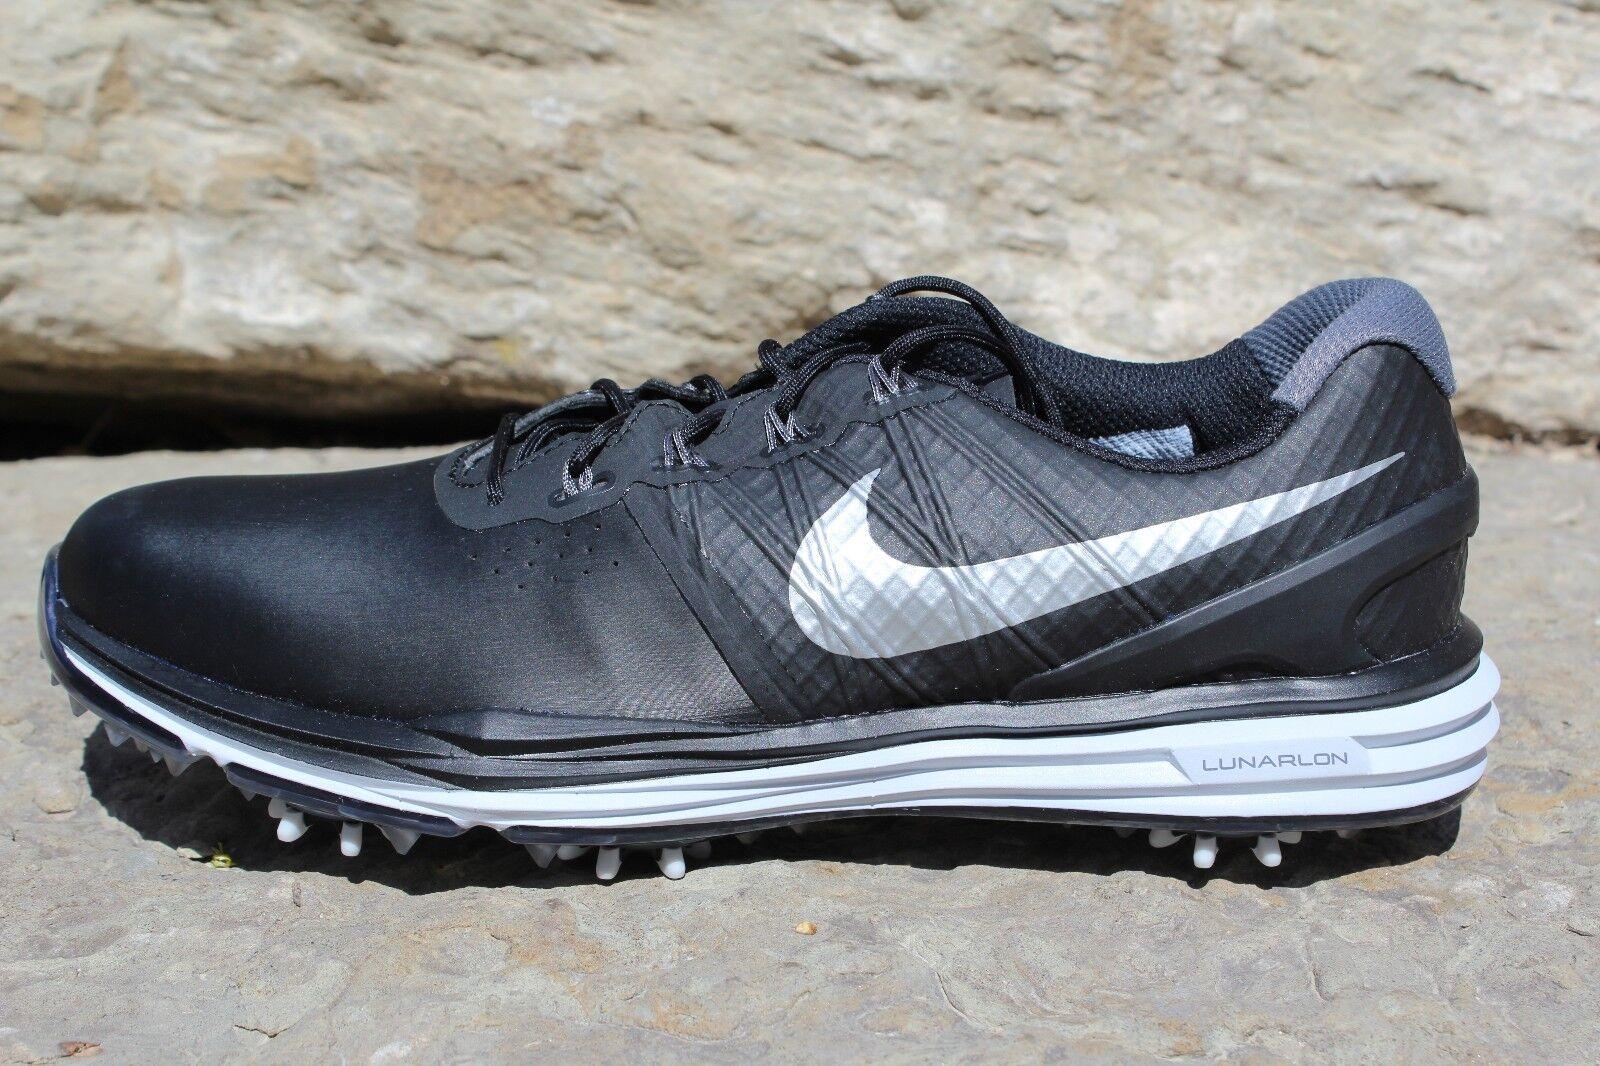 16 New Mens Nike lunar 3 control mens Black golf SZ shoes 704665 001 sneakers SZ golf 8 e58206